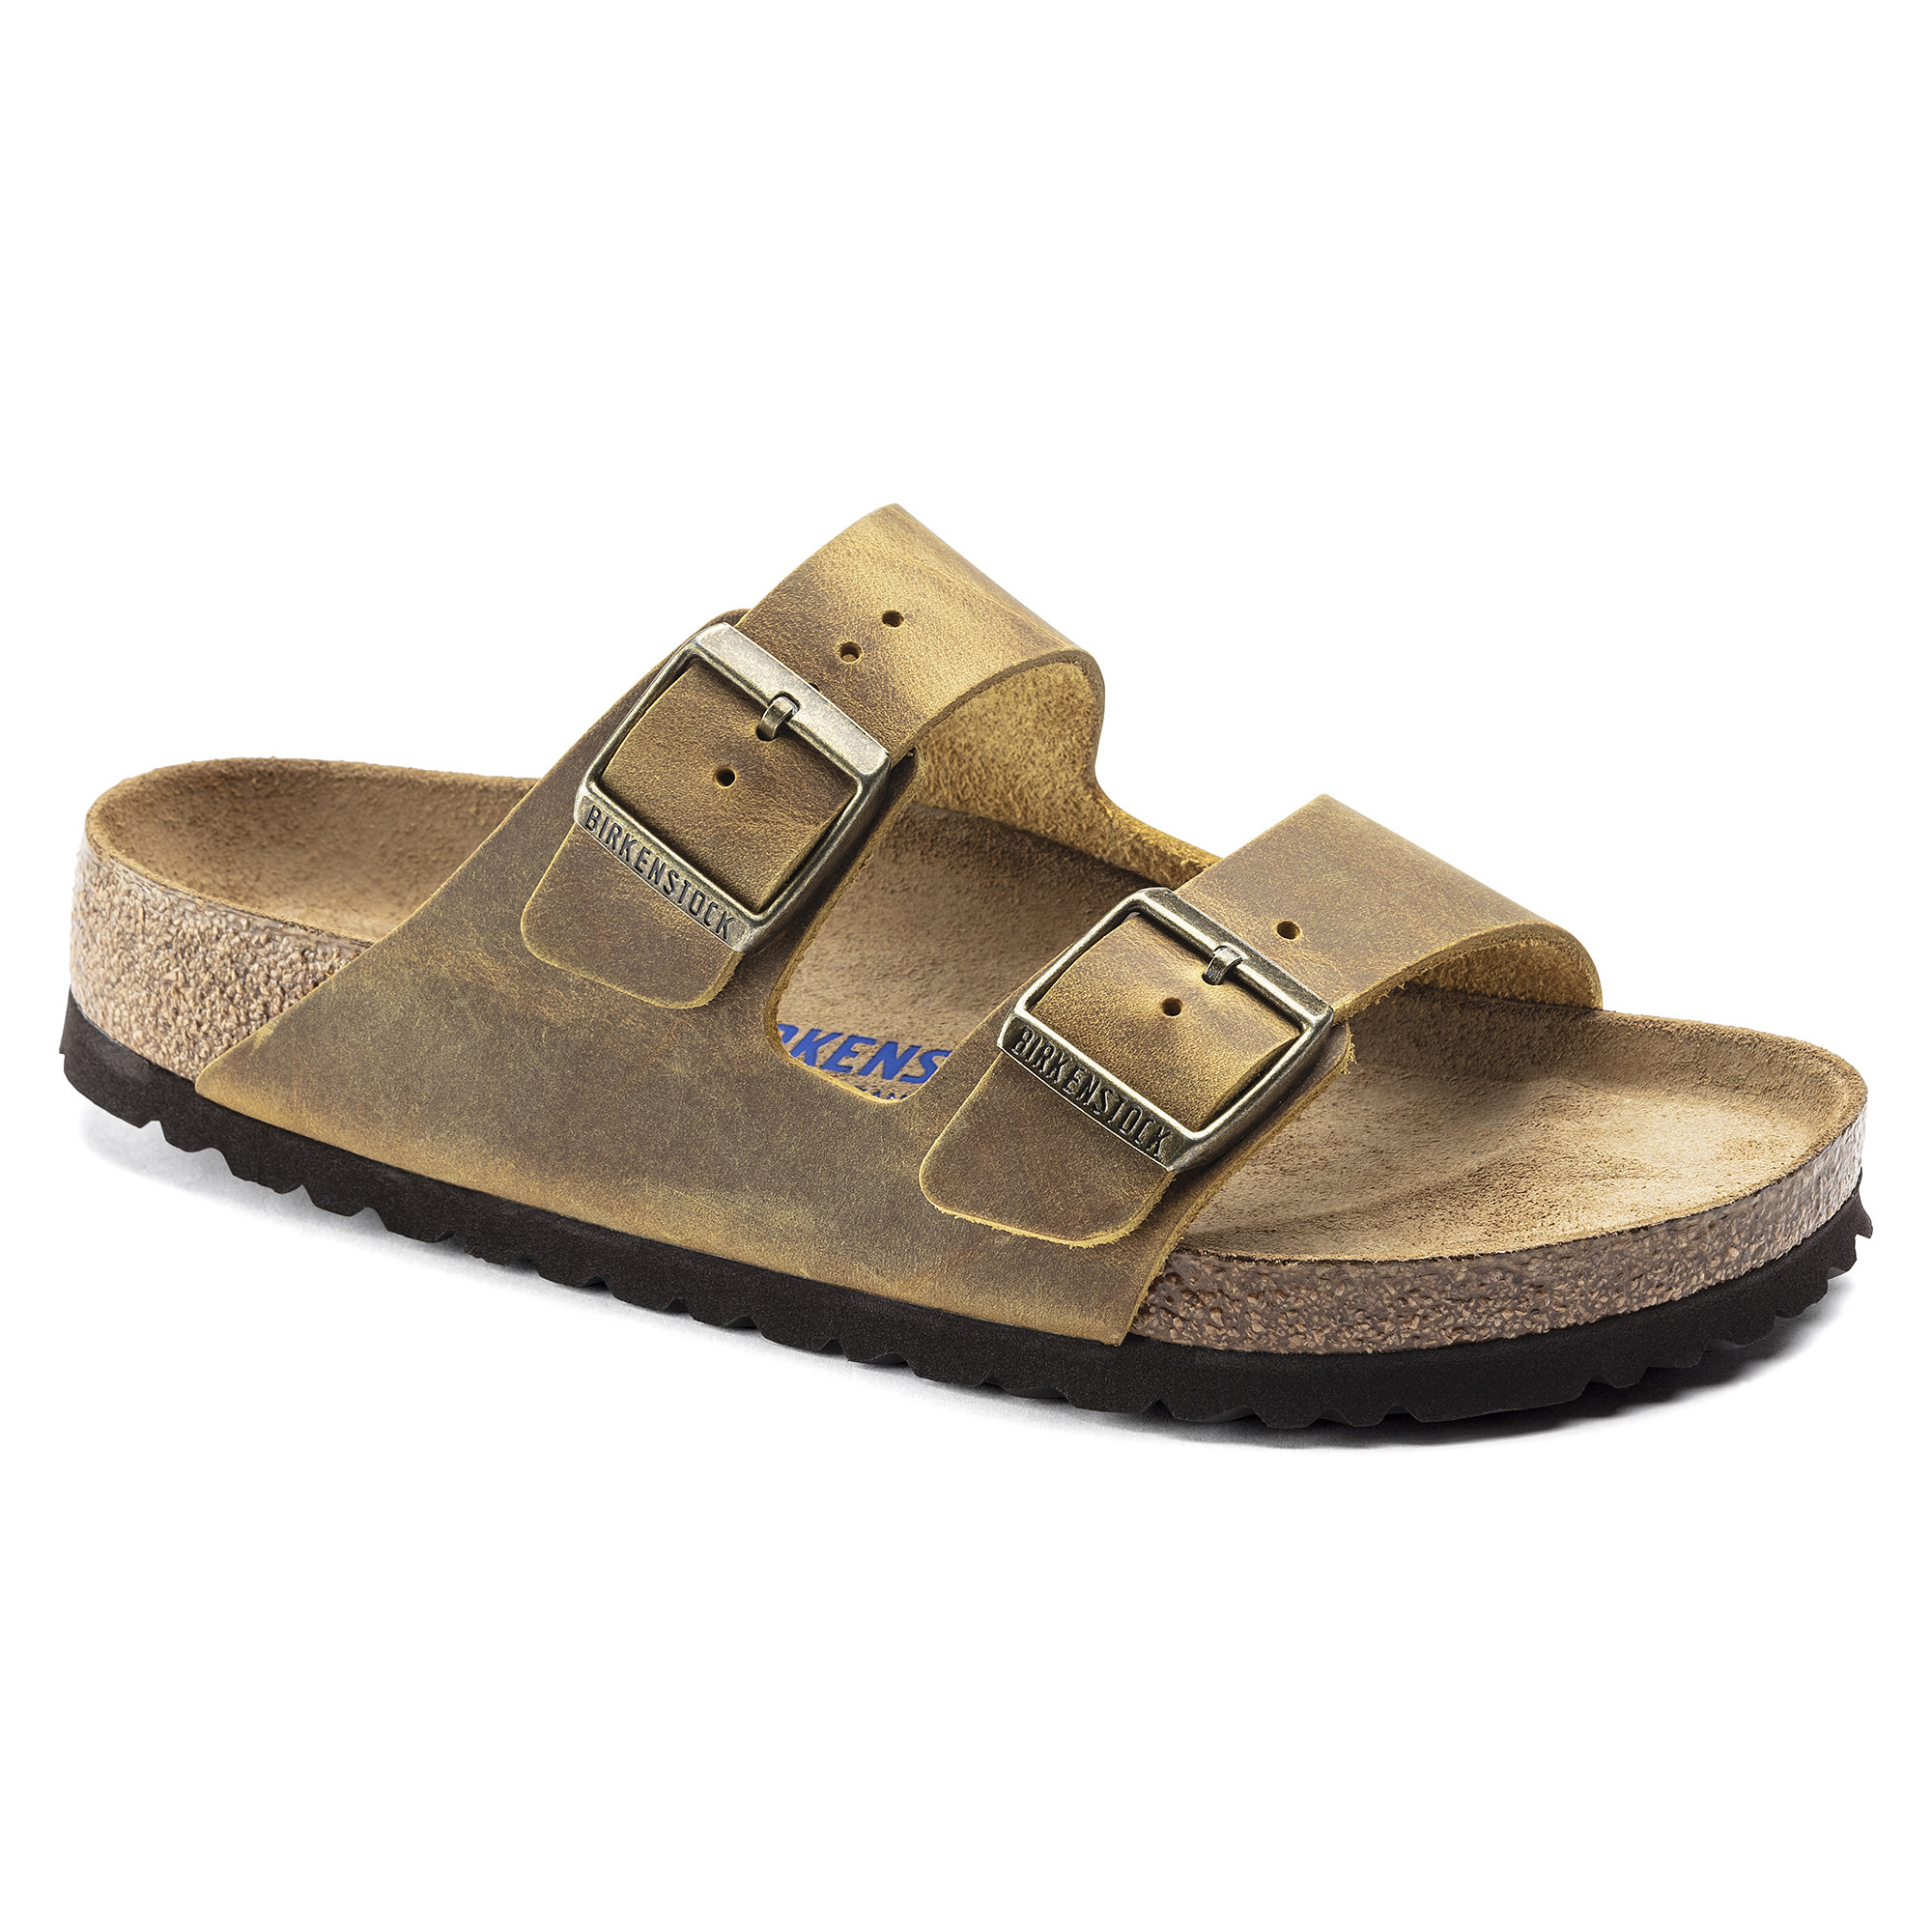 Birkenstock Birkenstock Arizona Soft Footbed -  Oiled Leather (Hommes - Régulier) - Ochre